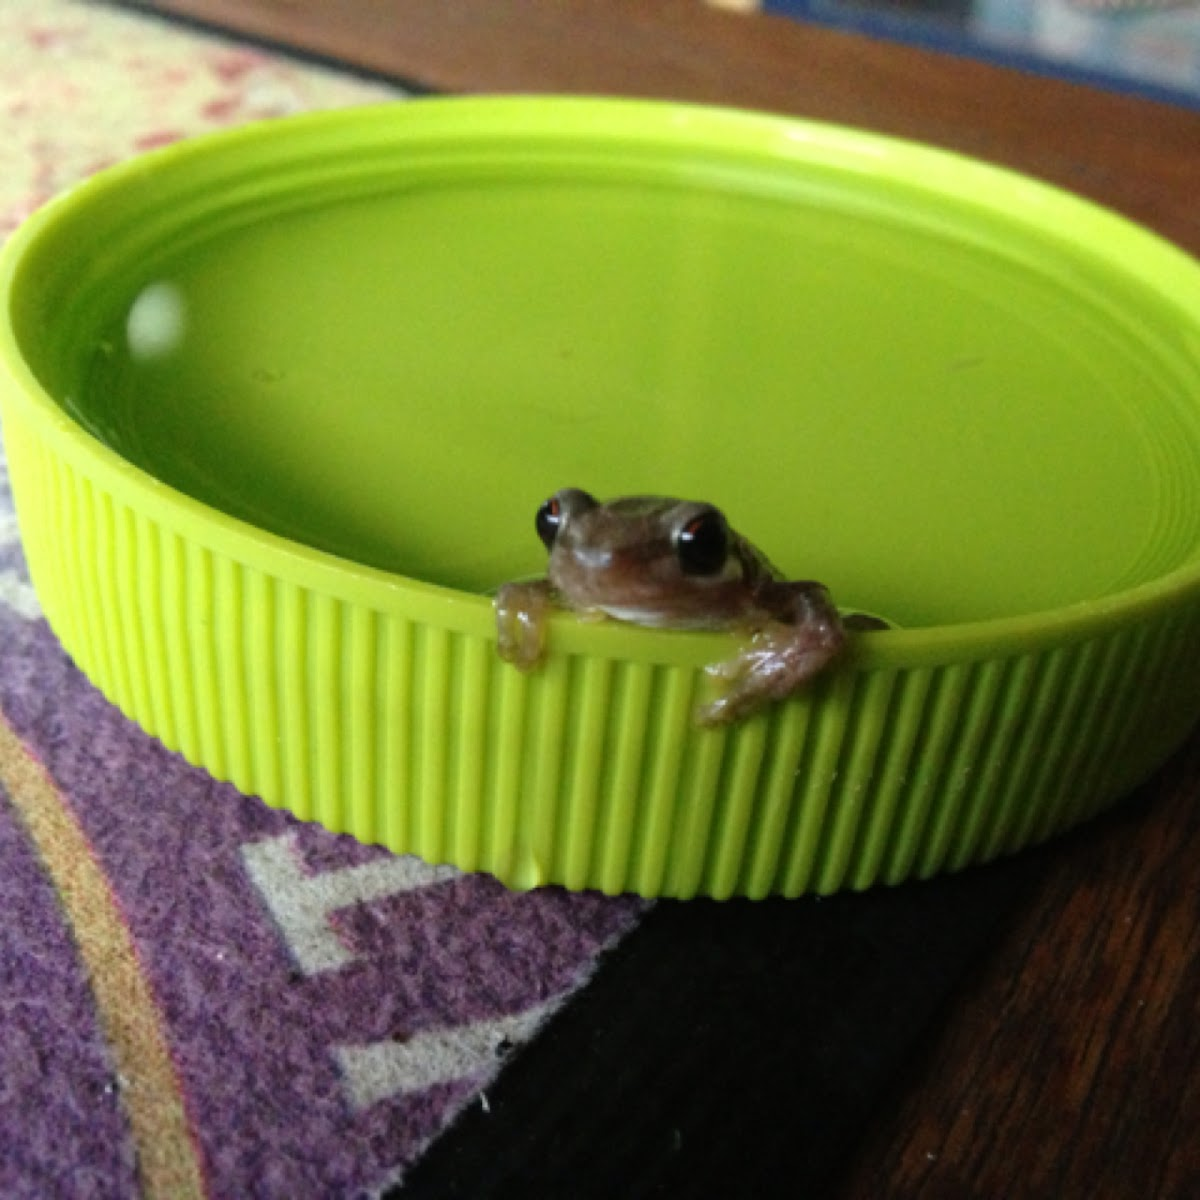 Bleating frog